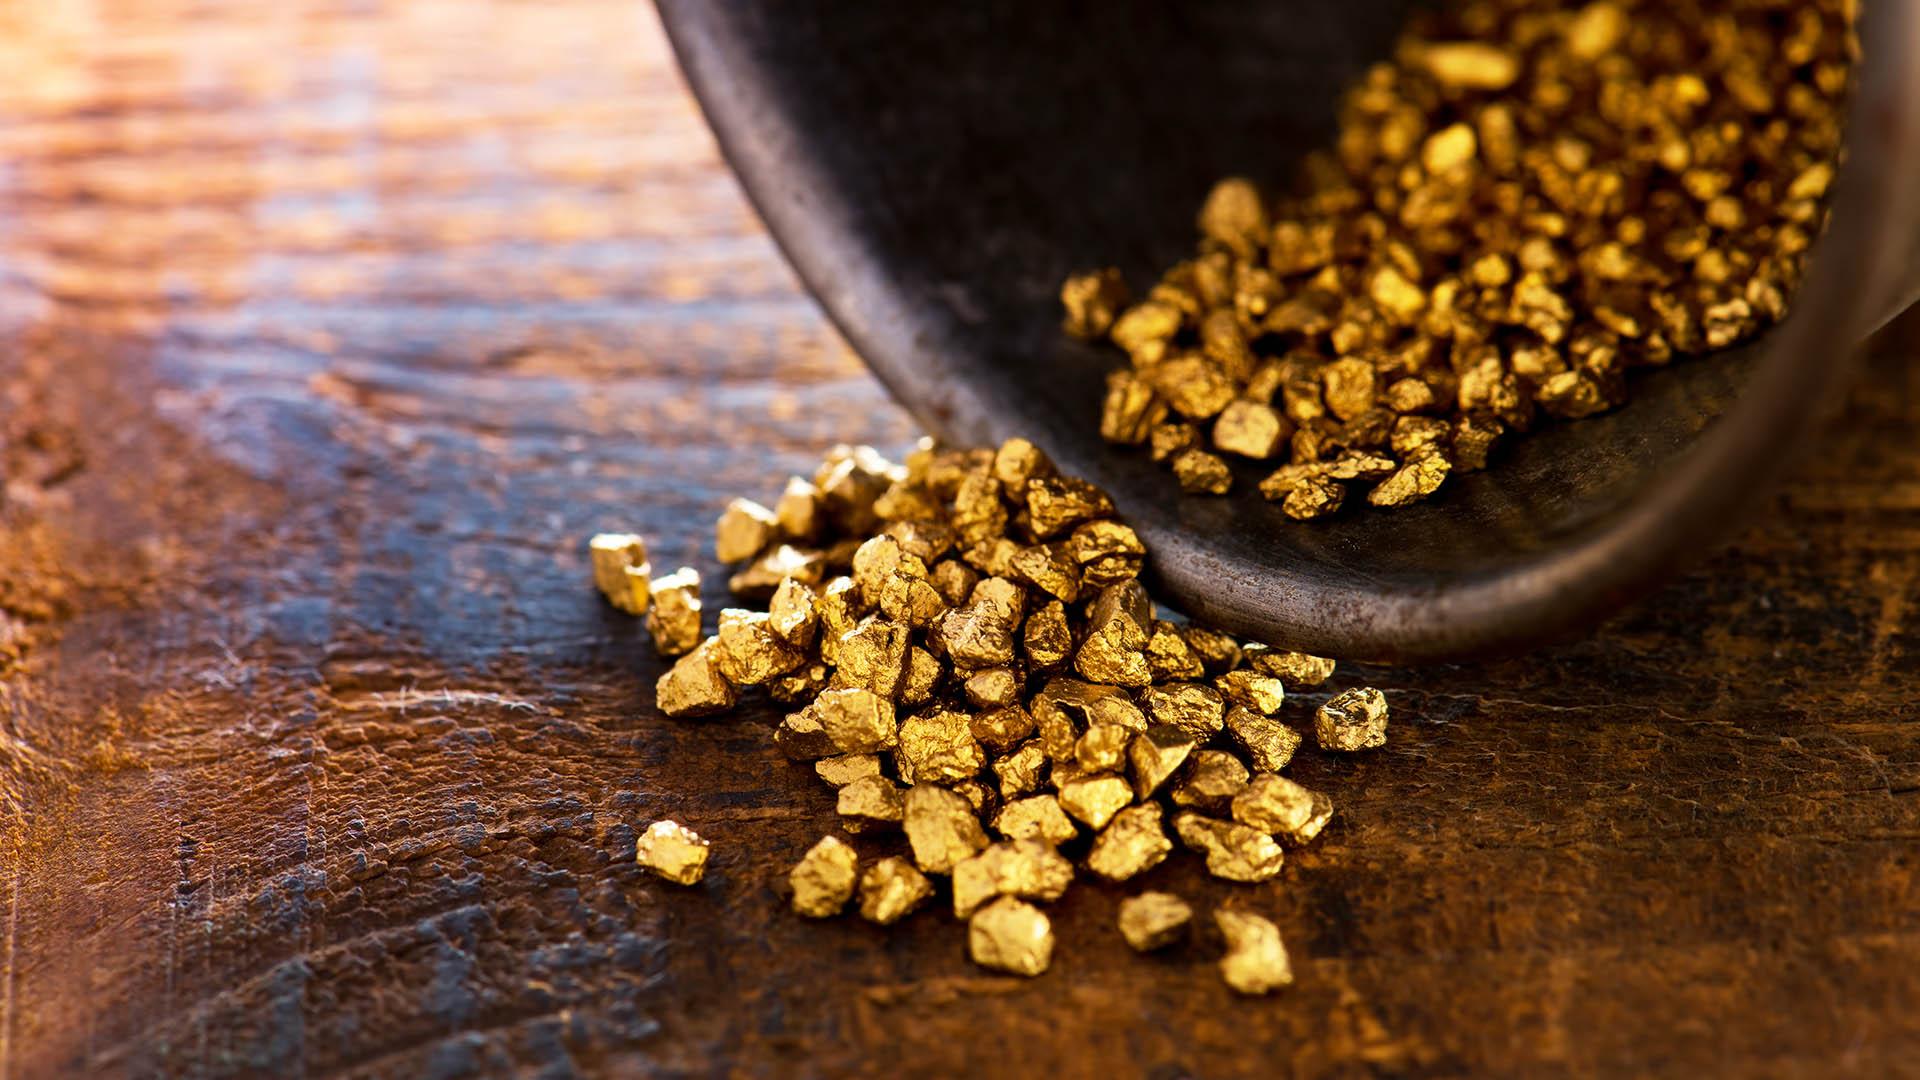 Horizon Minerals (ASX:HRZ) announces first gold pour at Boorara gold mine